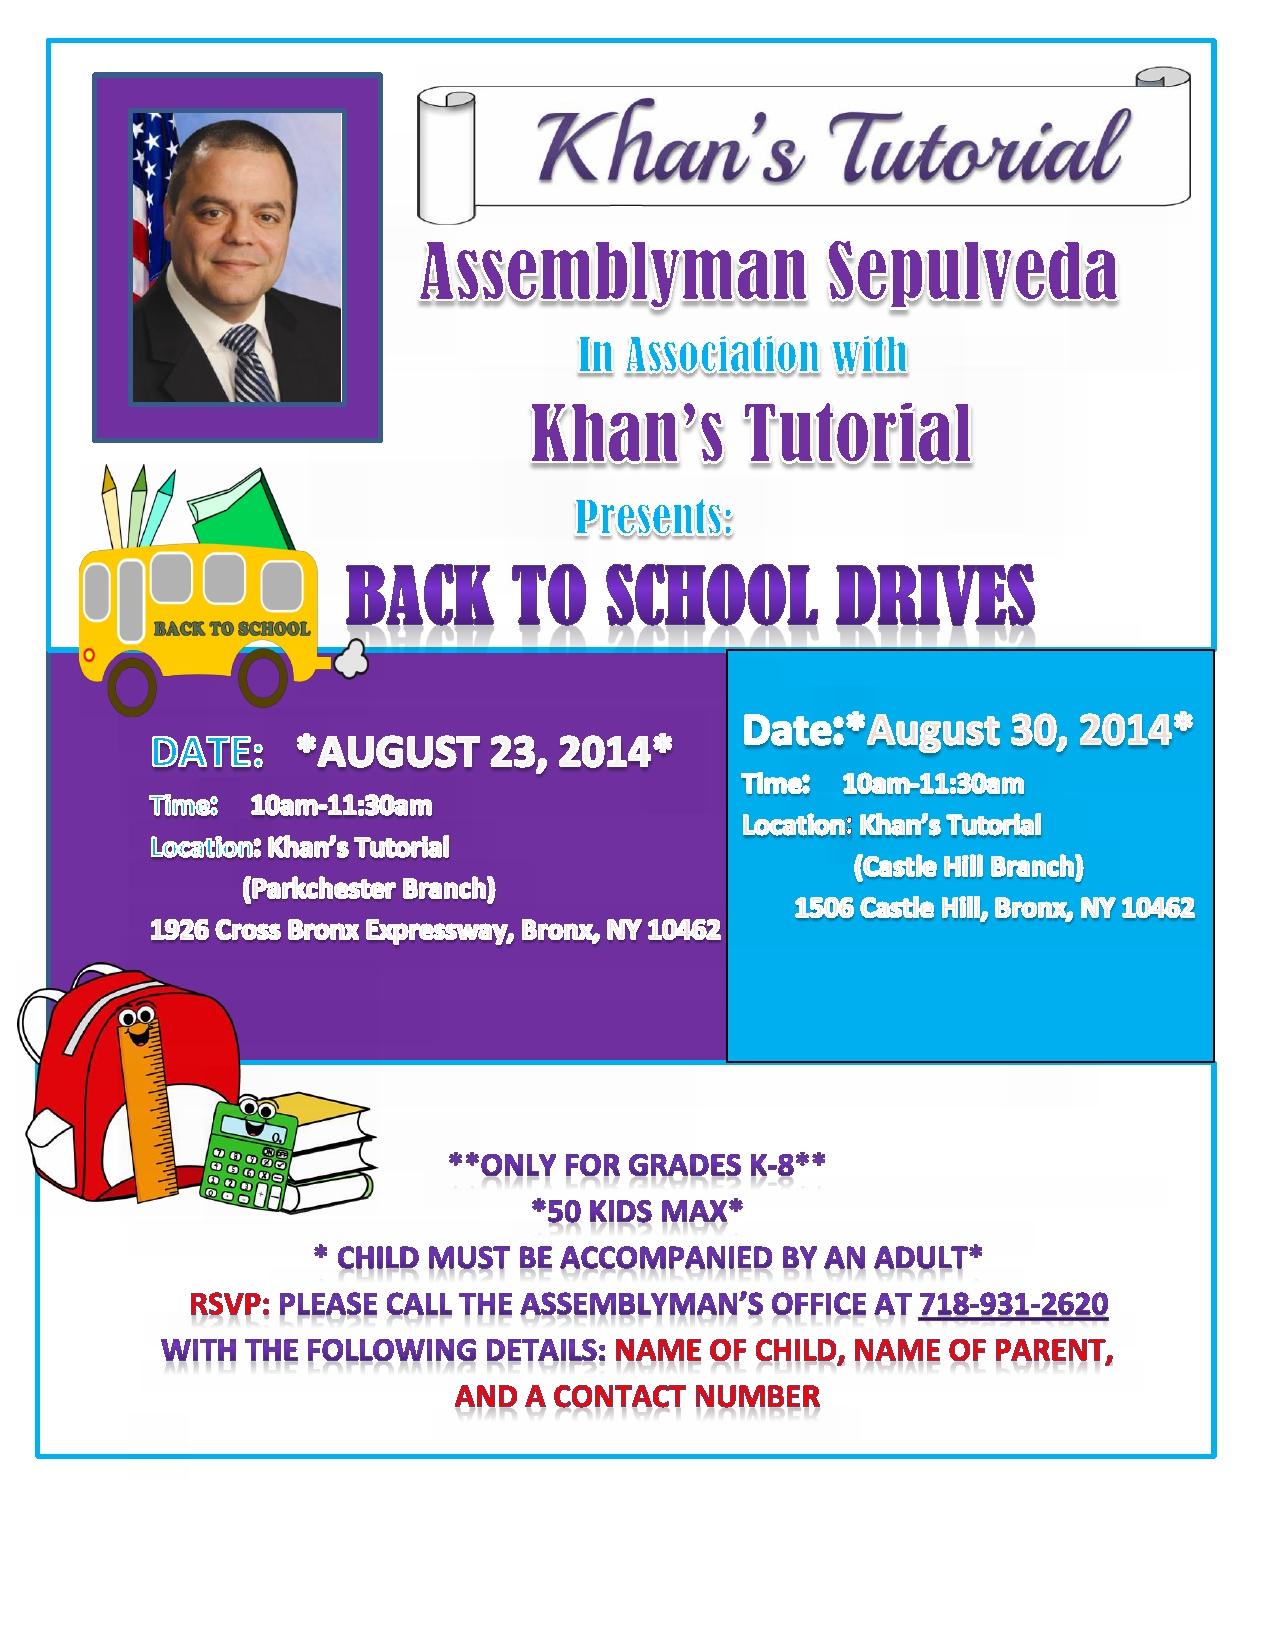 Khan's Tutorial Back to School Drive